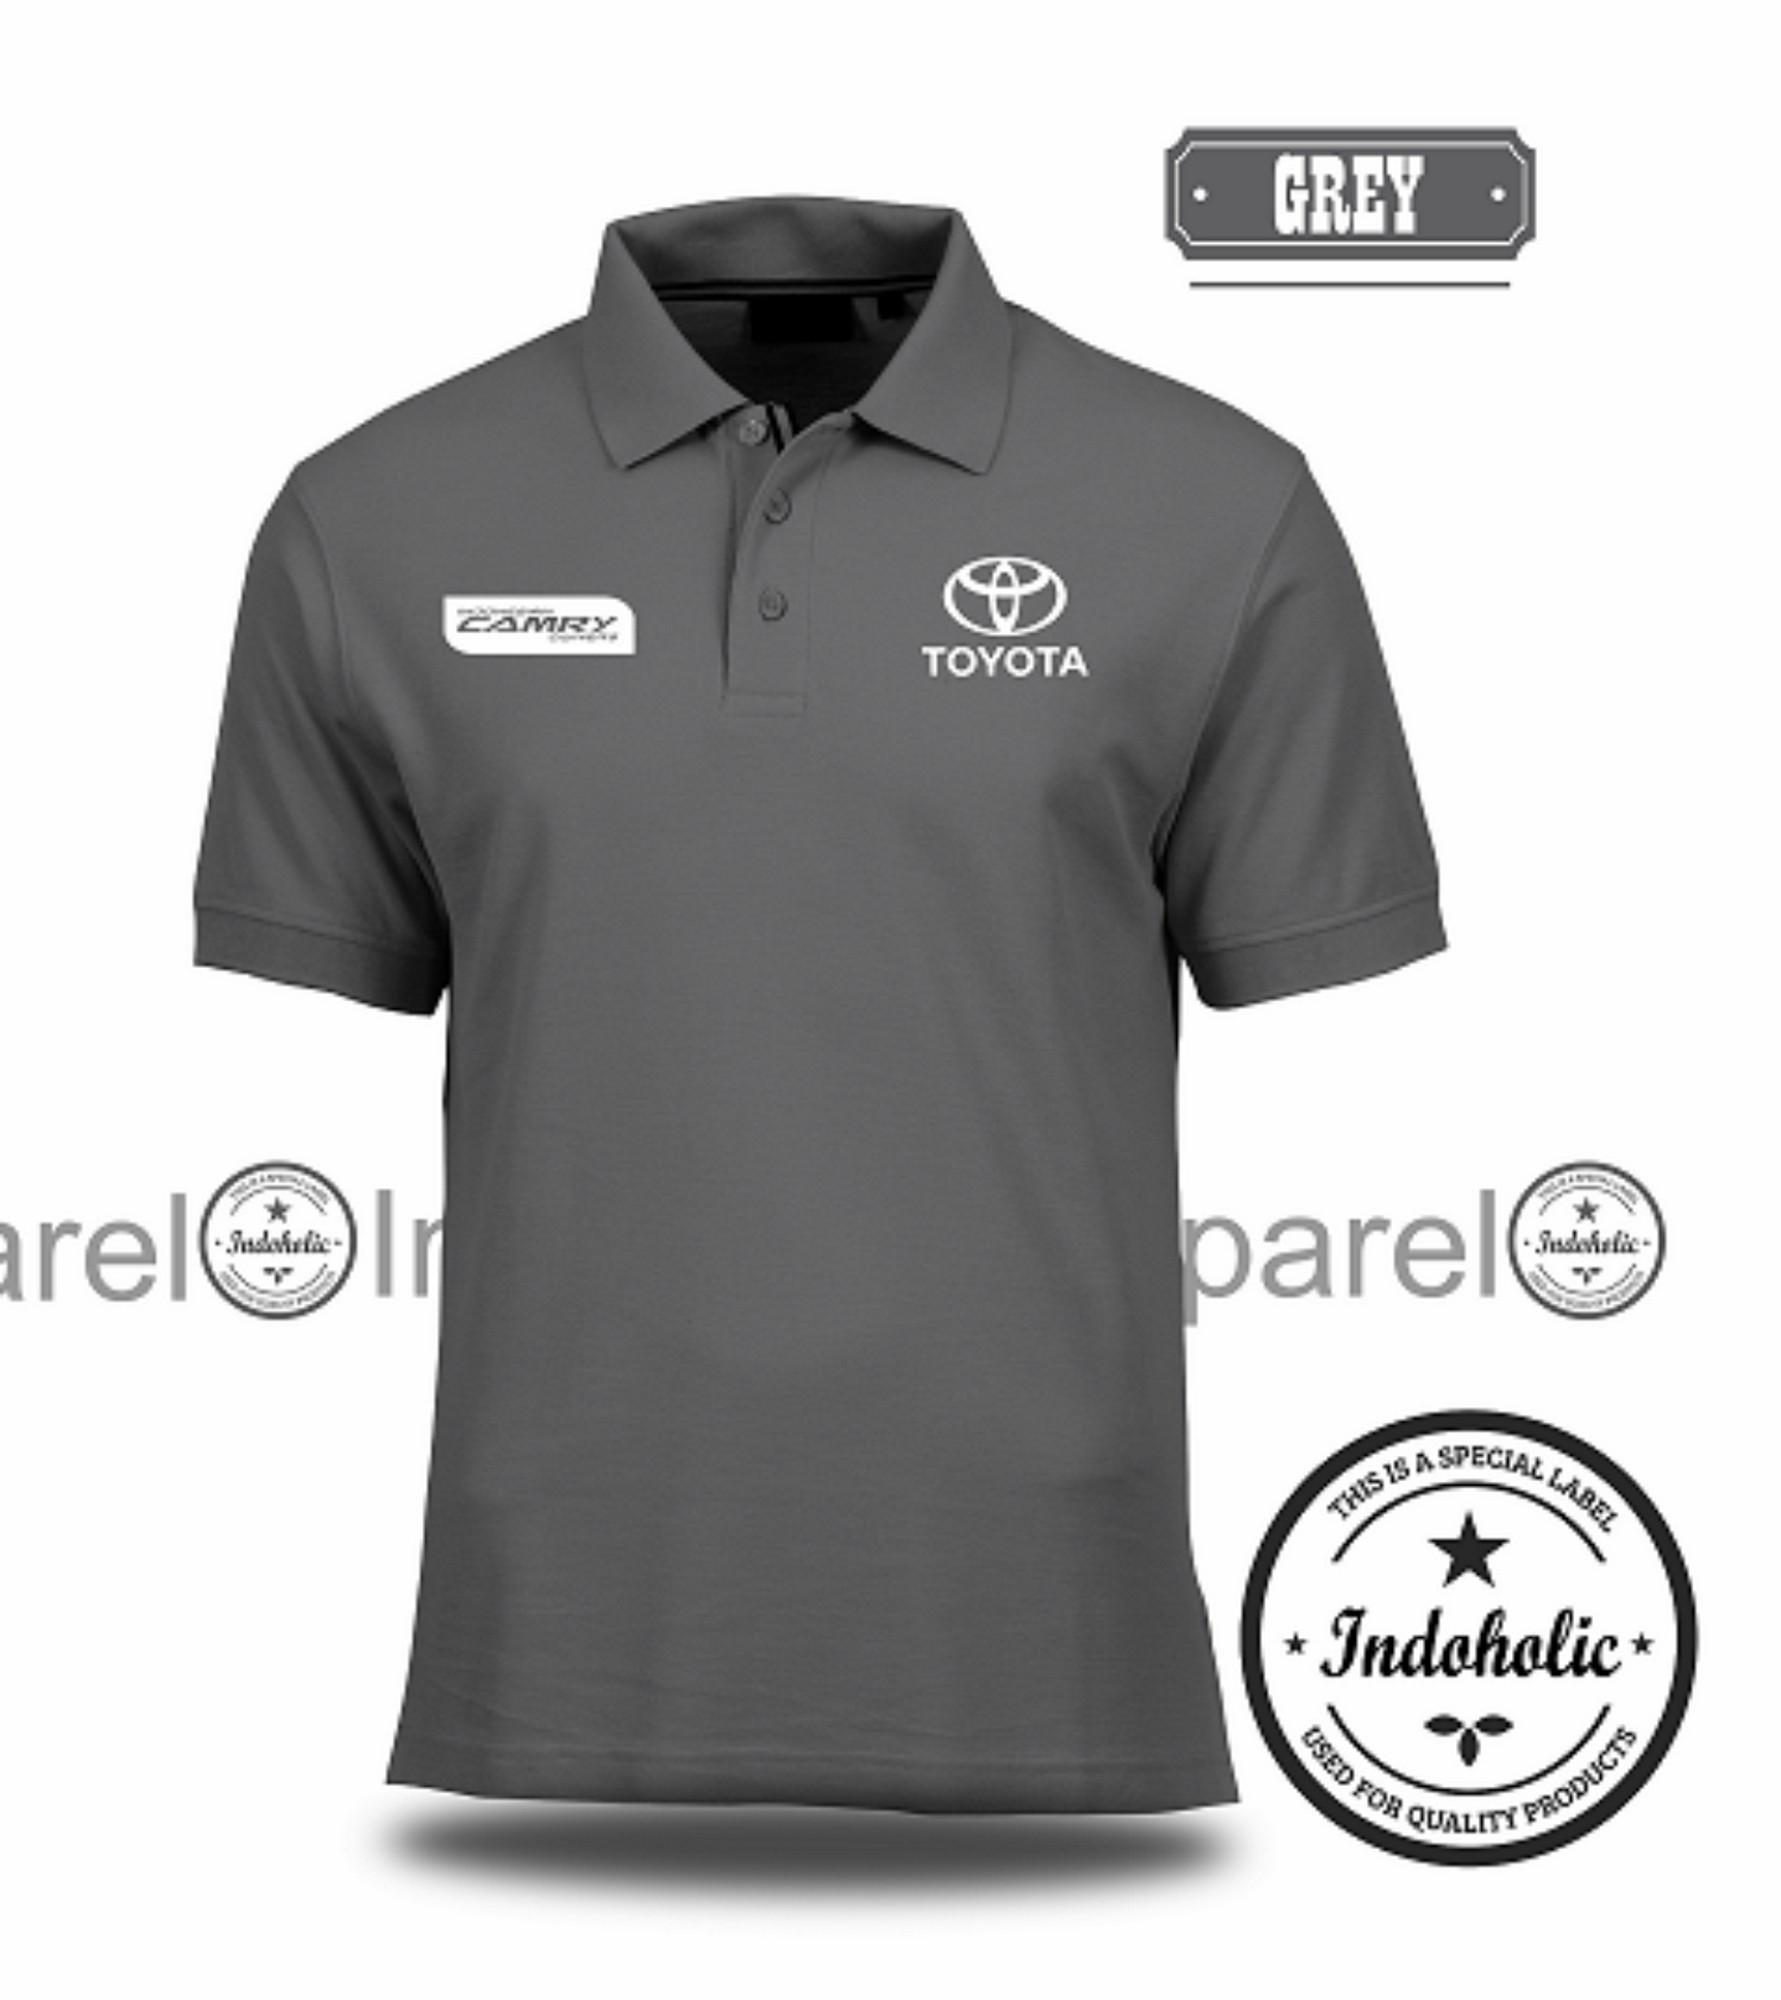 Polo Shirt Kaos Distro Mobil Sedan Sport Choper Toyota Camry Branded T-Shirt Fashion Pria Wanita Cowok Cewek Baju T-Shirt Jakarta Bandung Terbaru Jaman Now Kekinian Atasan Pakaian Polos Pendek Kerah Berkera